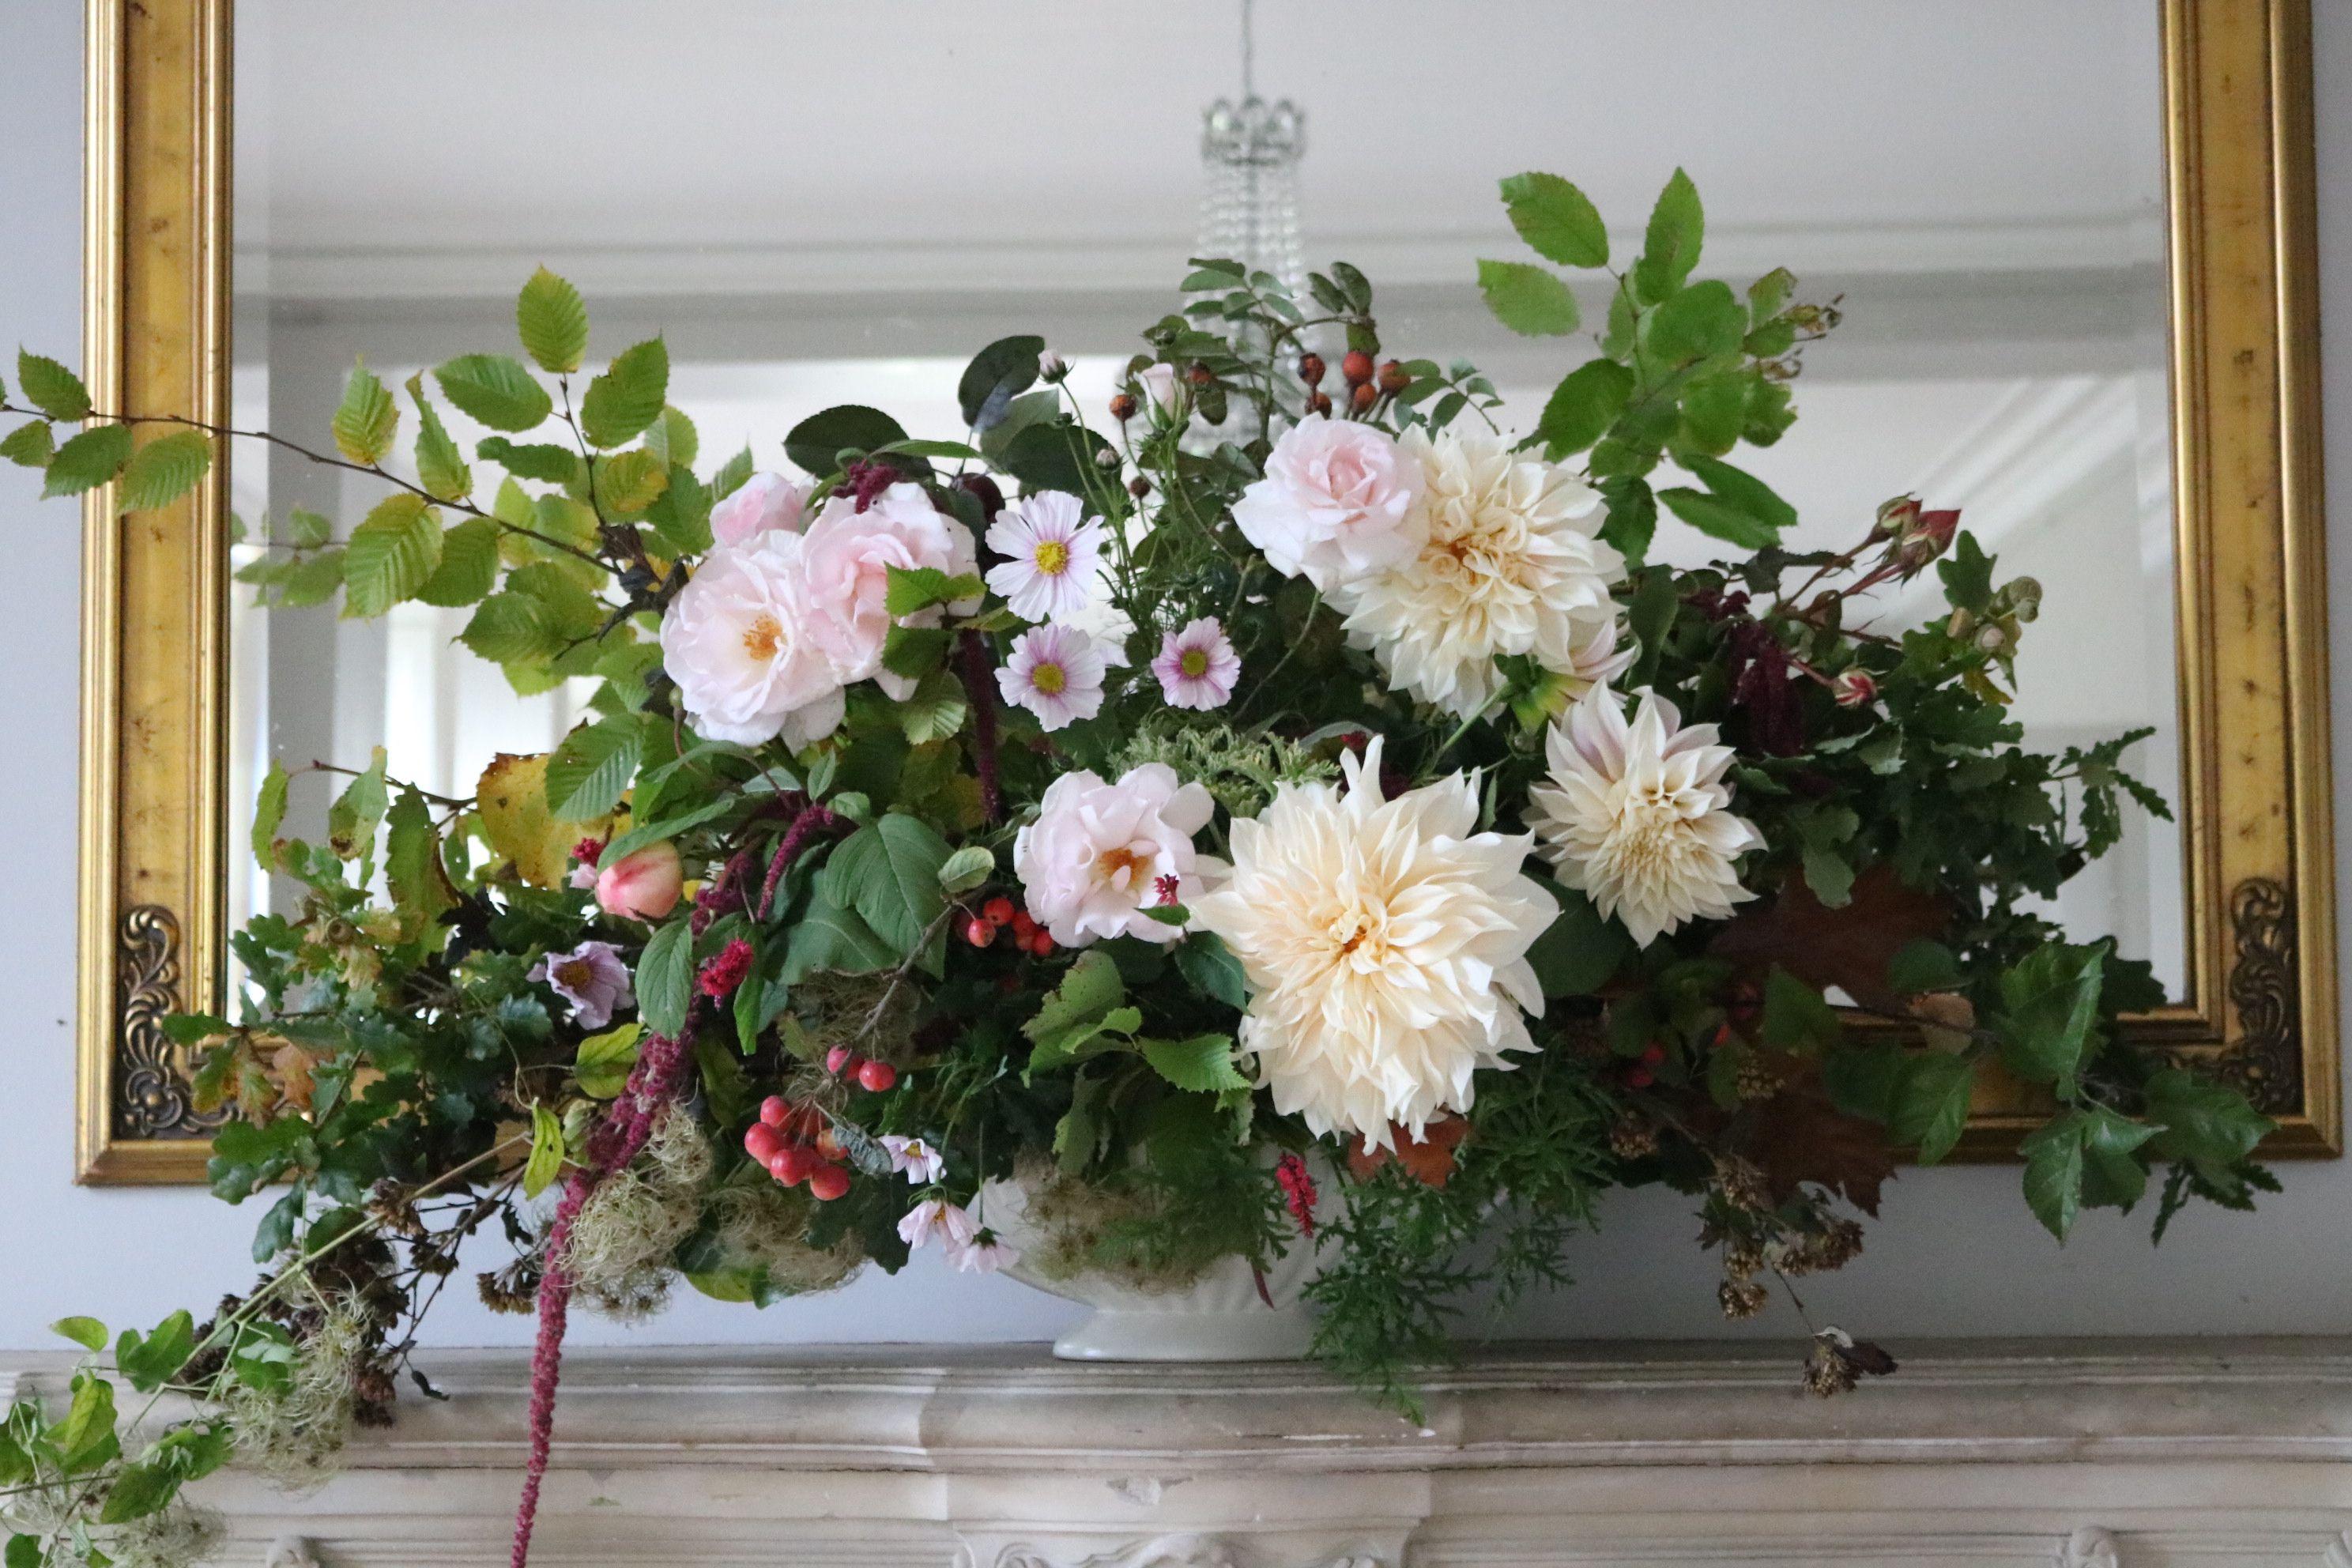 No Floral Foam Pedestal Vase Five Foot Wide Arrangement On The Mantlepiece At Sparkford Hall In Somerset For A Gorgeo Flower Farm Flower Farmer Flower Delivery